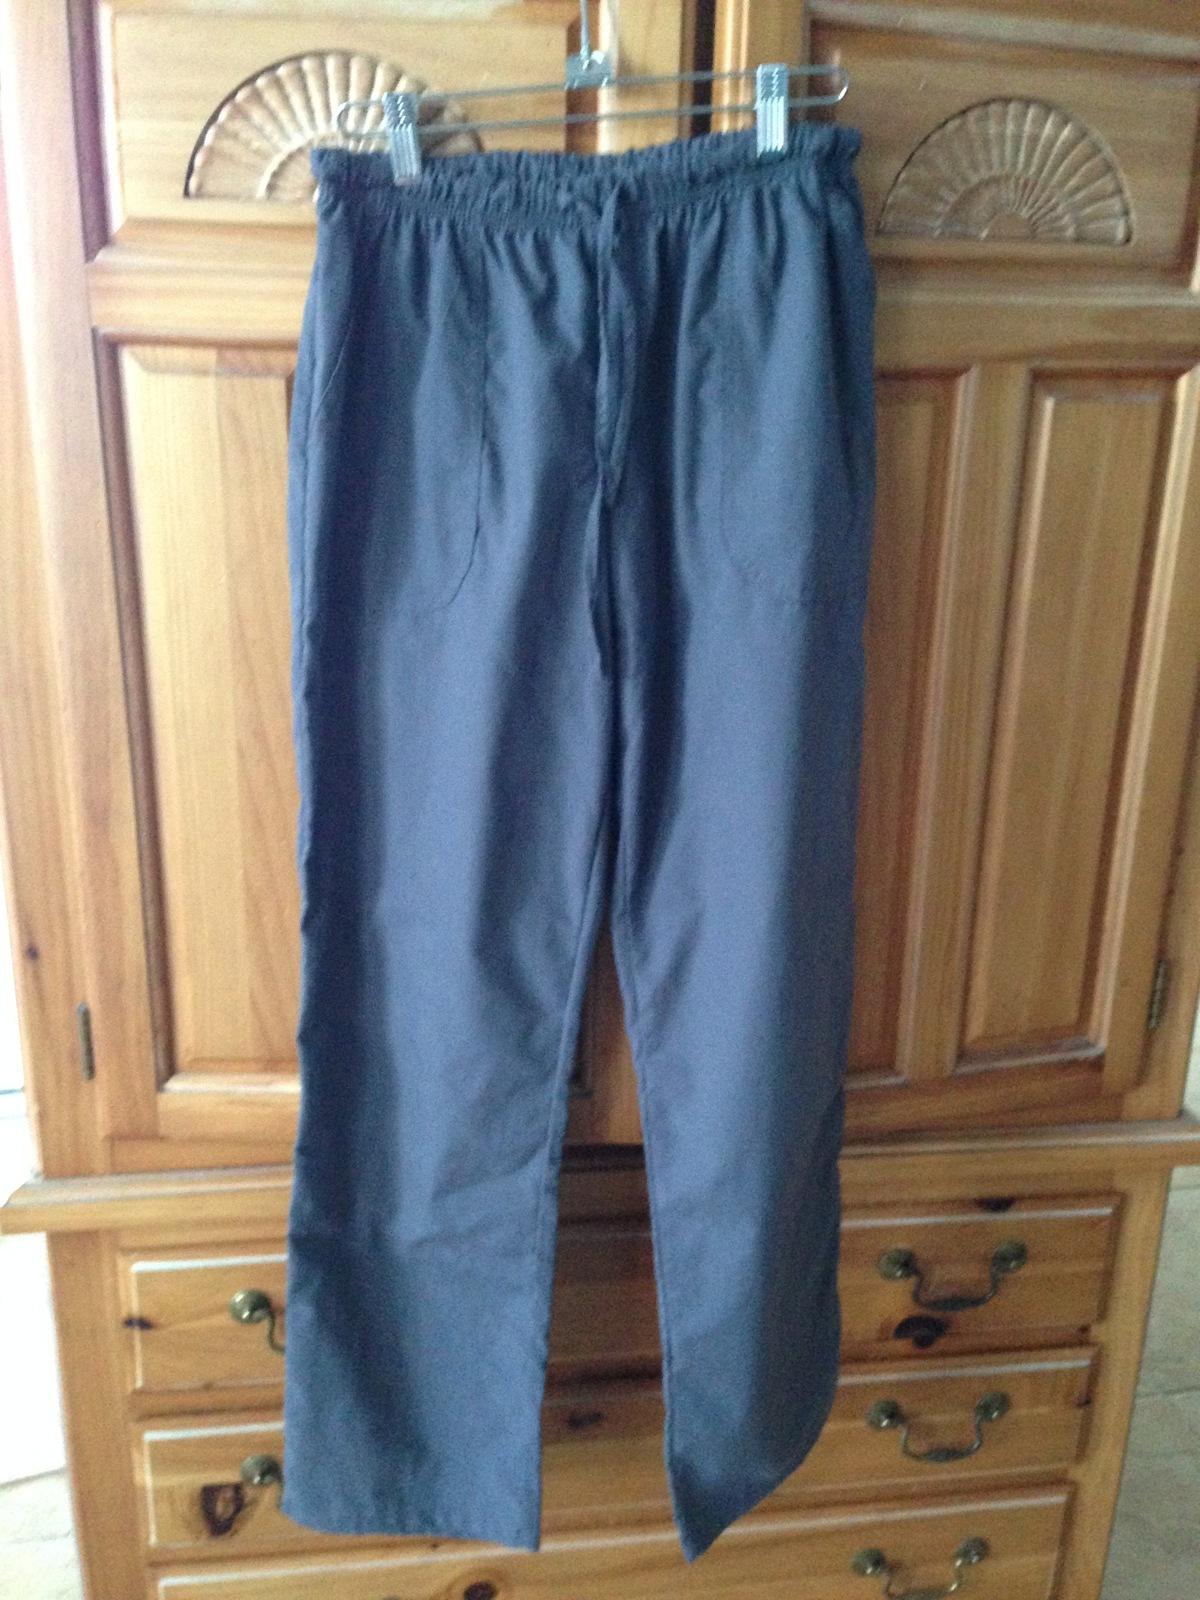 fc7c7290b44 Image. Image. Previous. Women's Grey Drawstring 2 pocket Scrubs Pants Size  Medium by Denice